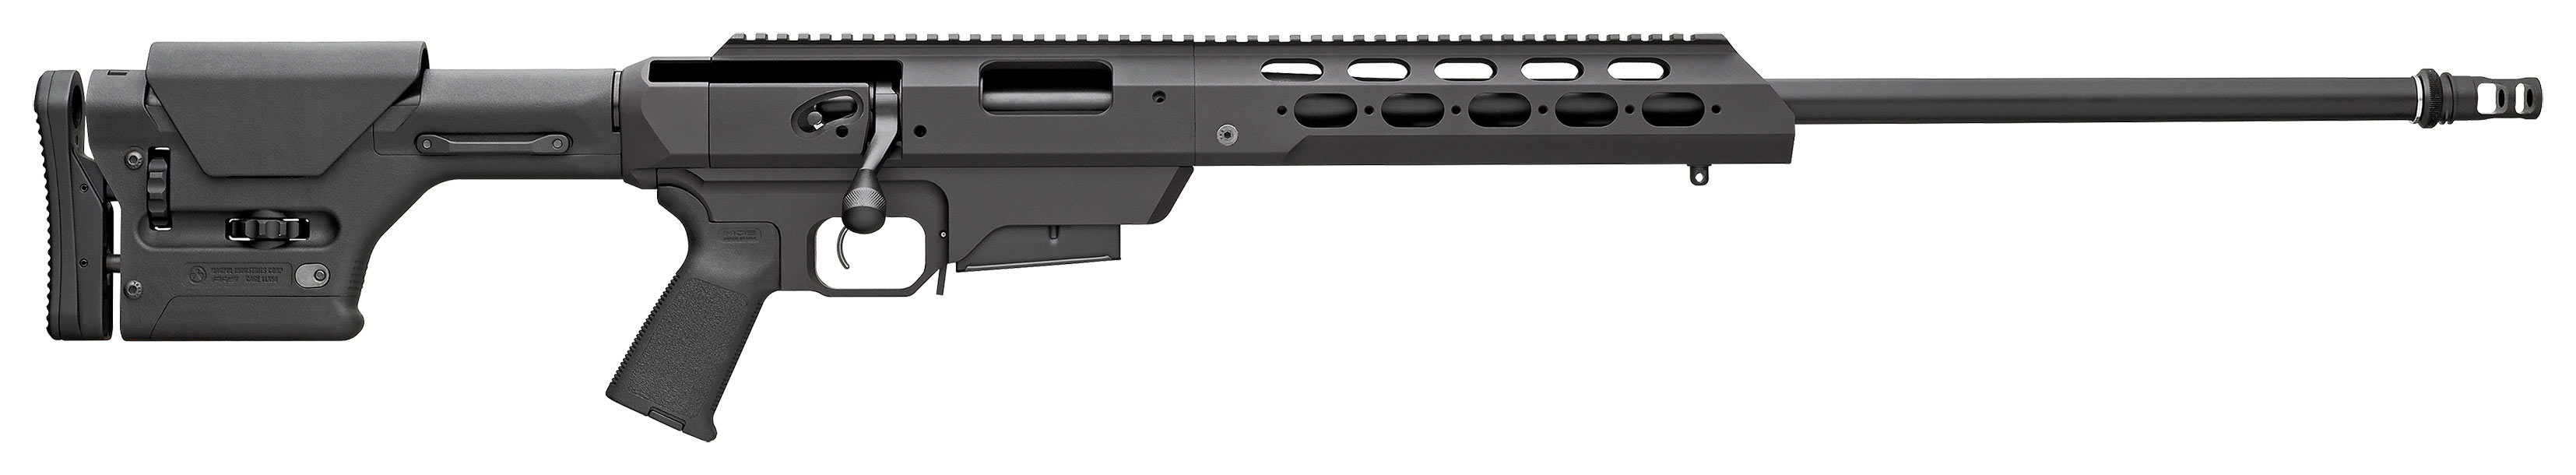 Remington model 700 tactical chasis - remington 700 sniper rifle